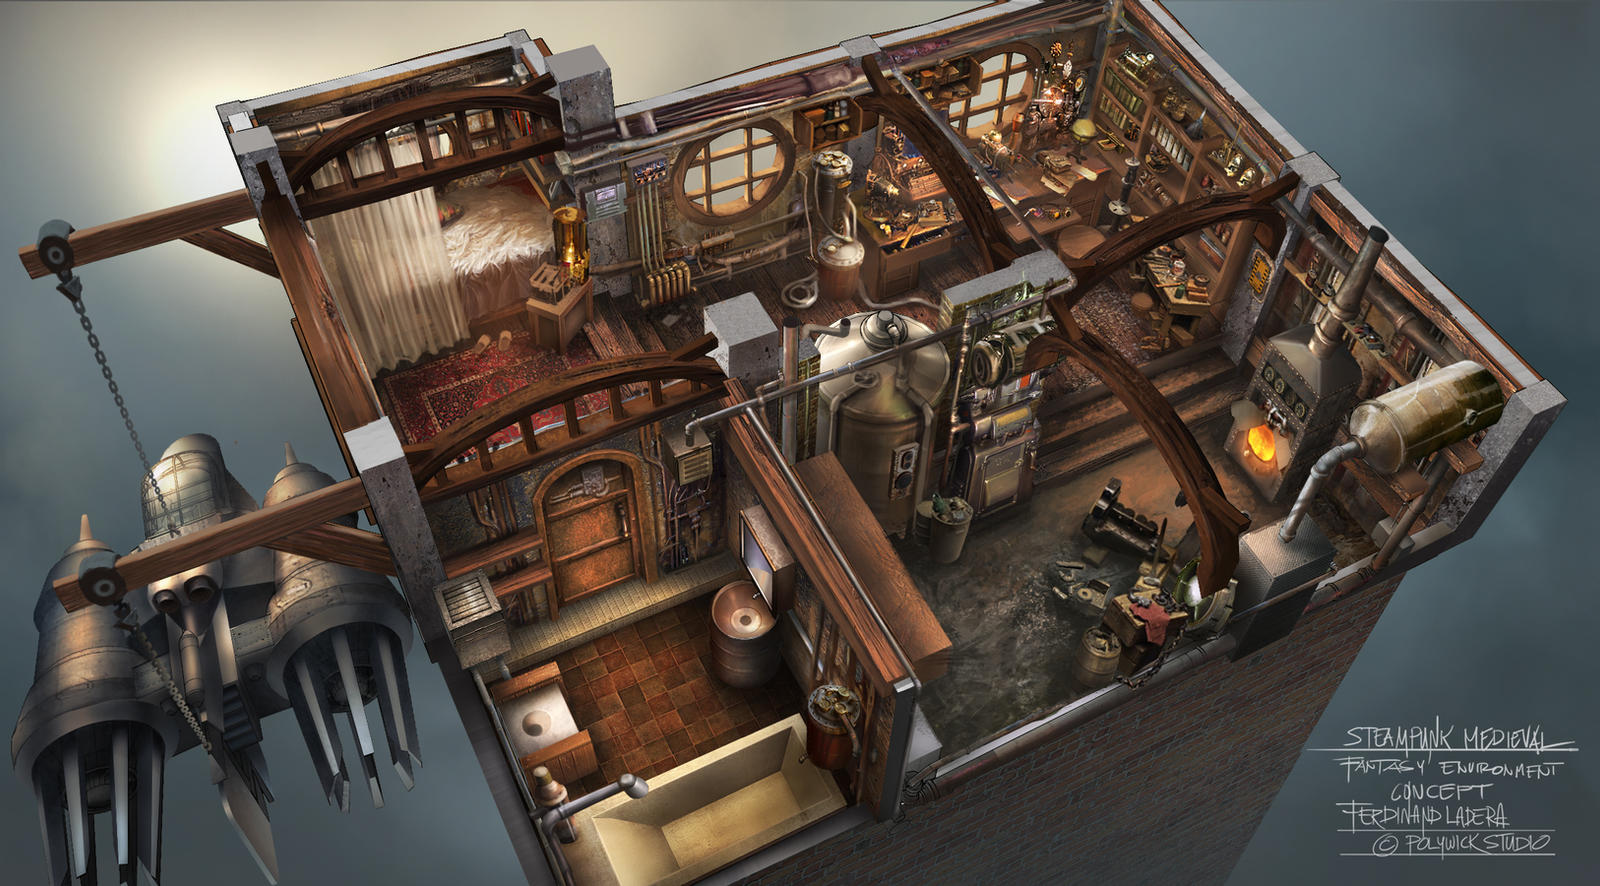 Steampunk Interior By Ferdinandladera On Deviantart